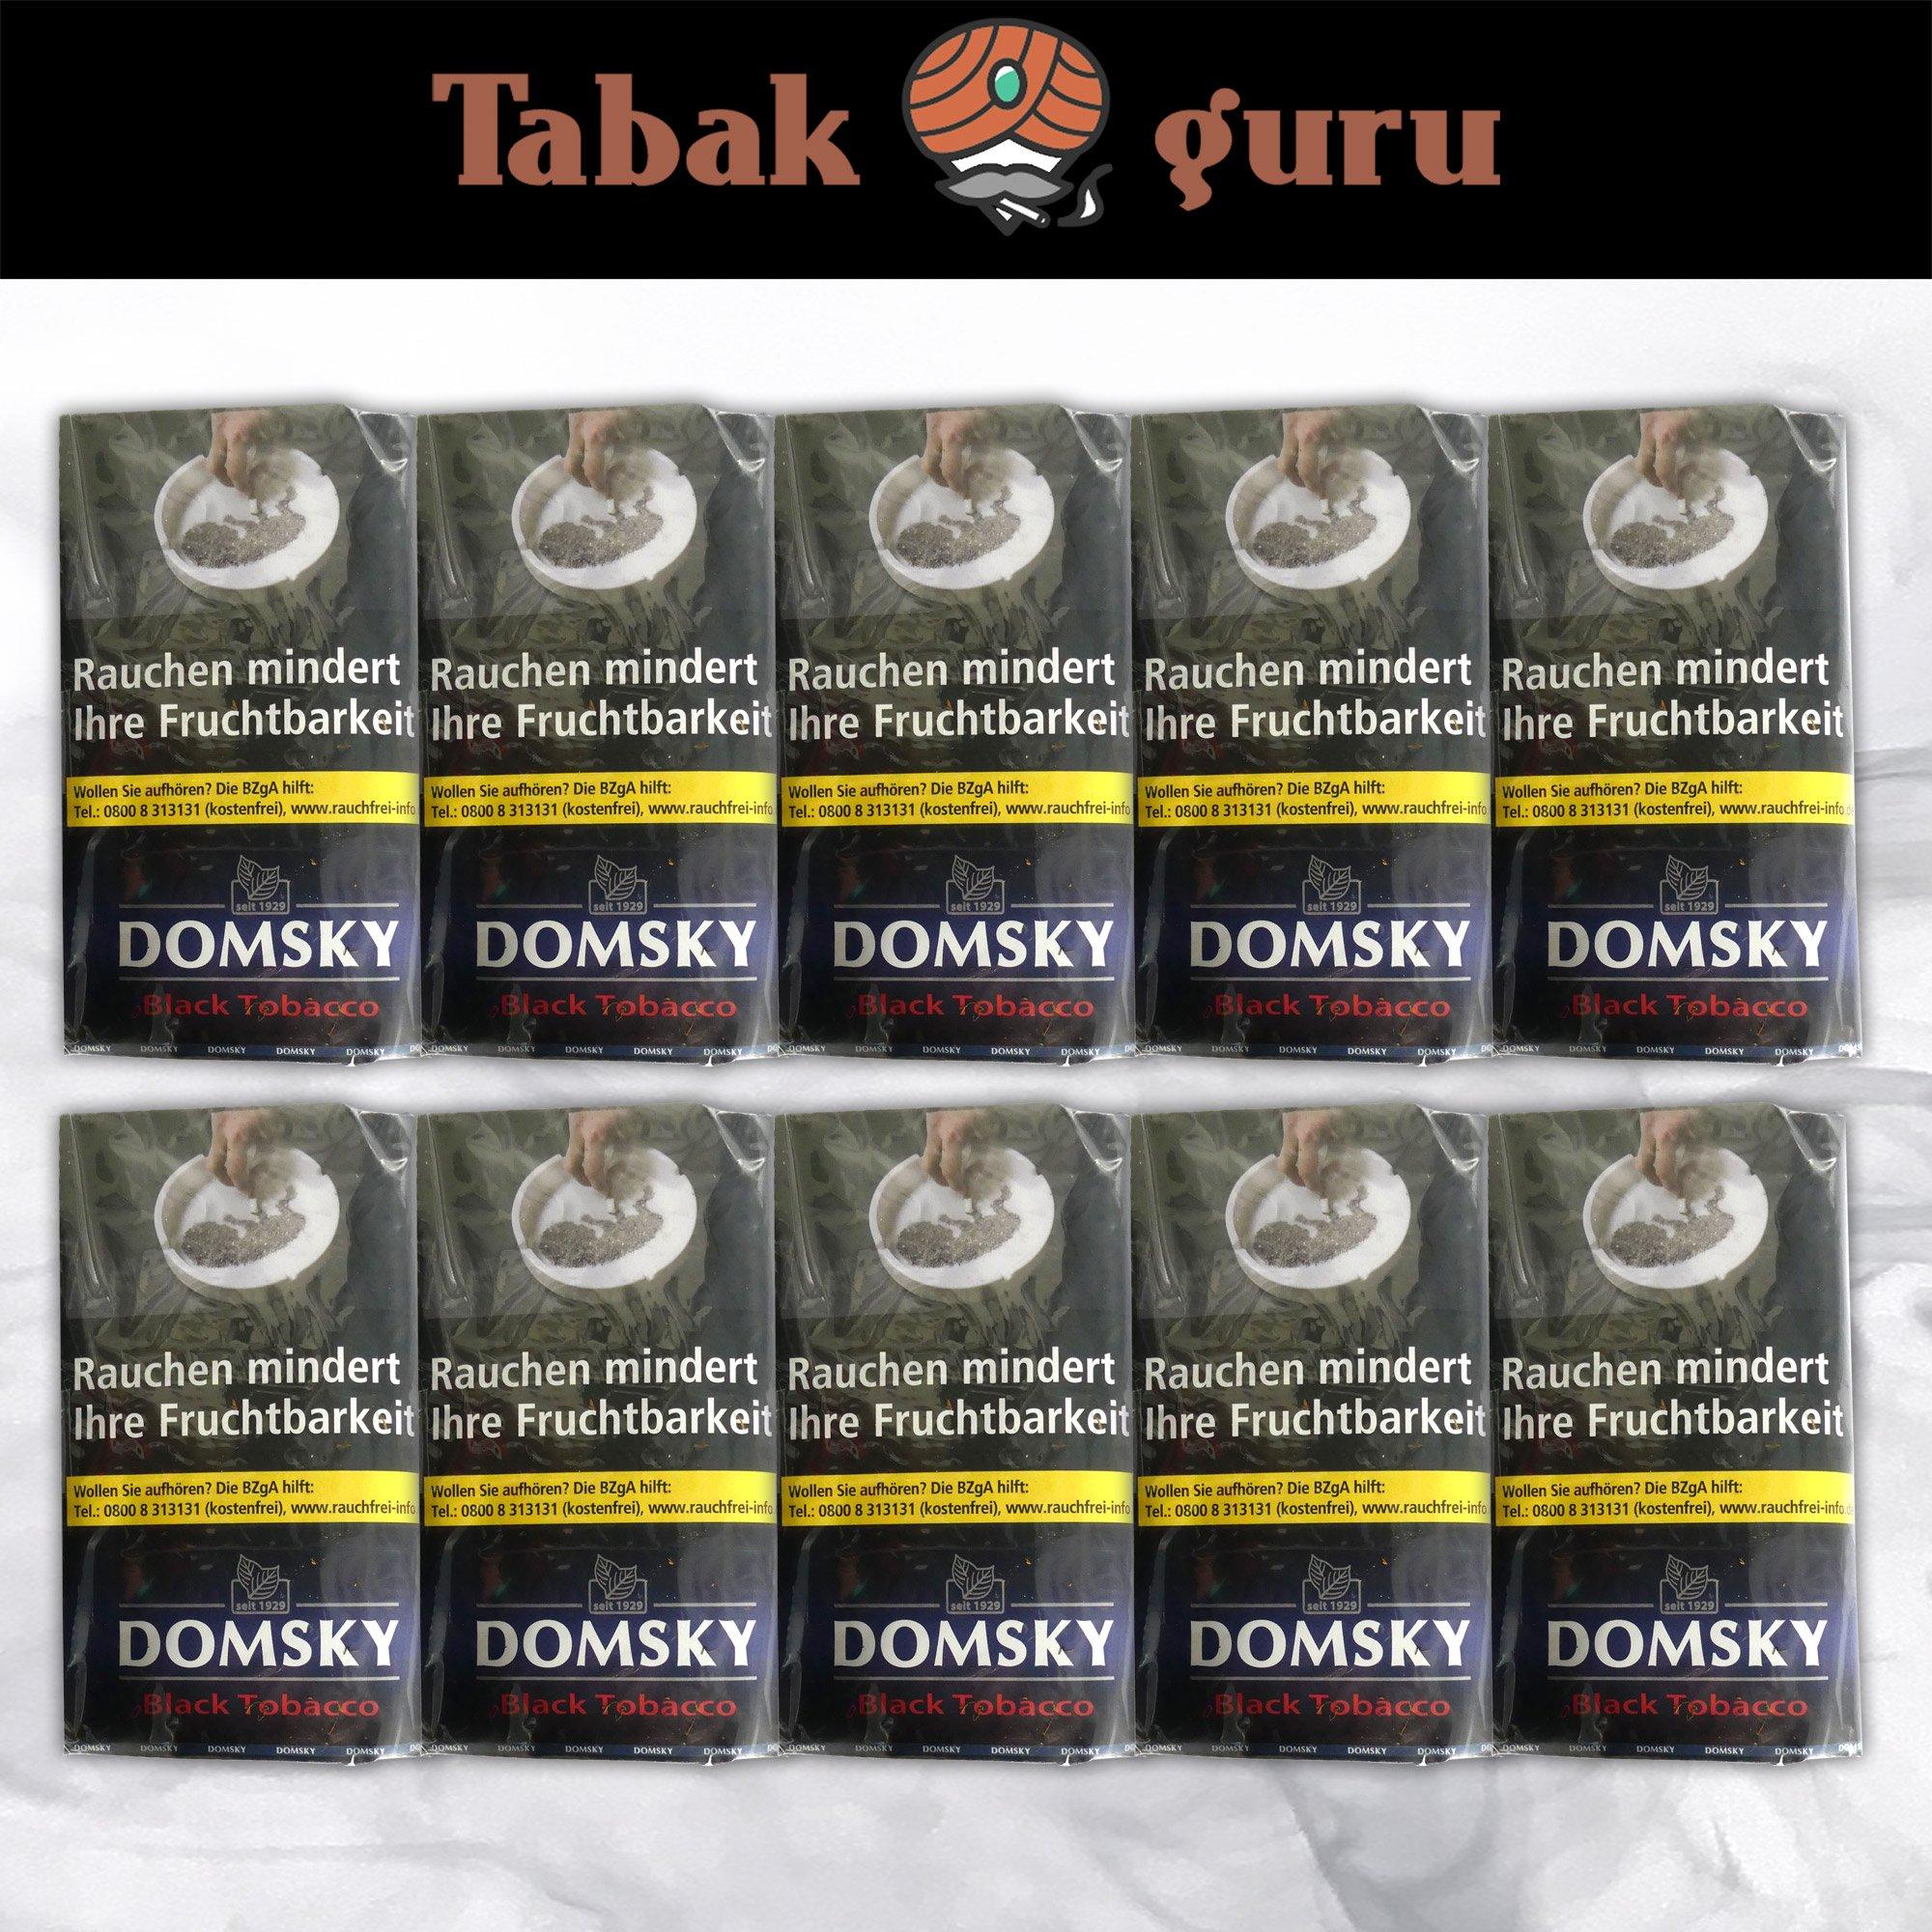 10 x DOMSKY Black Tobacco Drehtabak 40 g